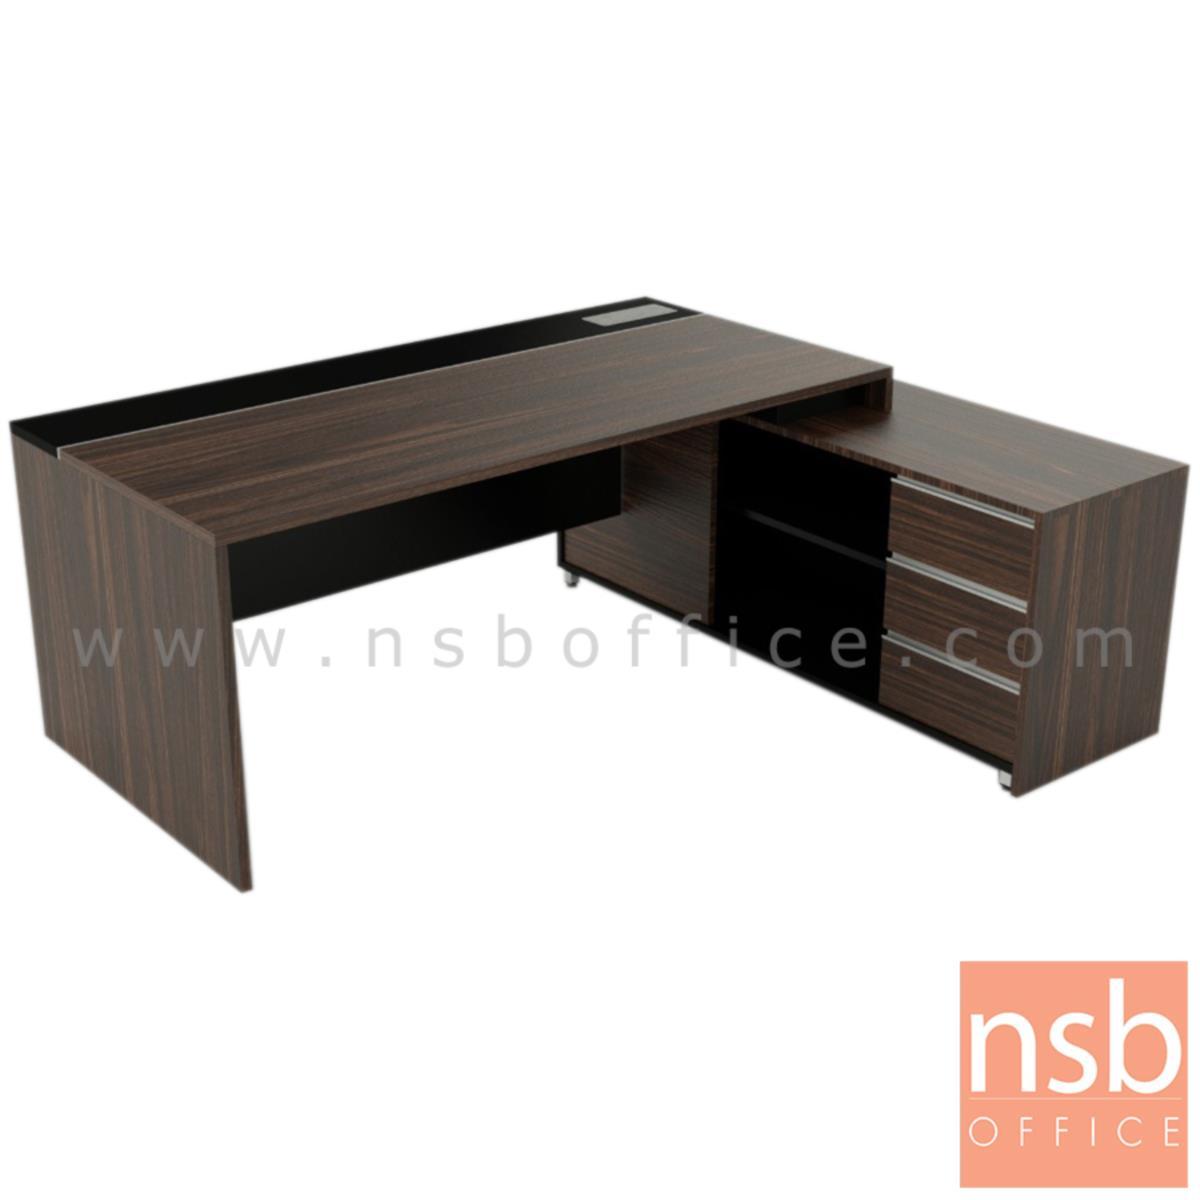 A30A030:โต๊ะผู้บริหารตัวแอล รุ่น WISCONCIN (วิสคอนซิน) ขนาด 180W ,200W cm. พร้อมตู้ข้าง